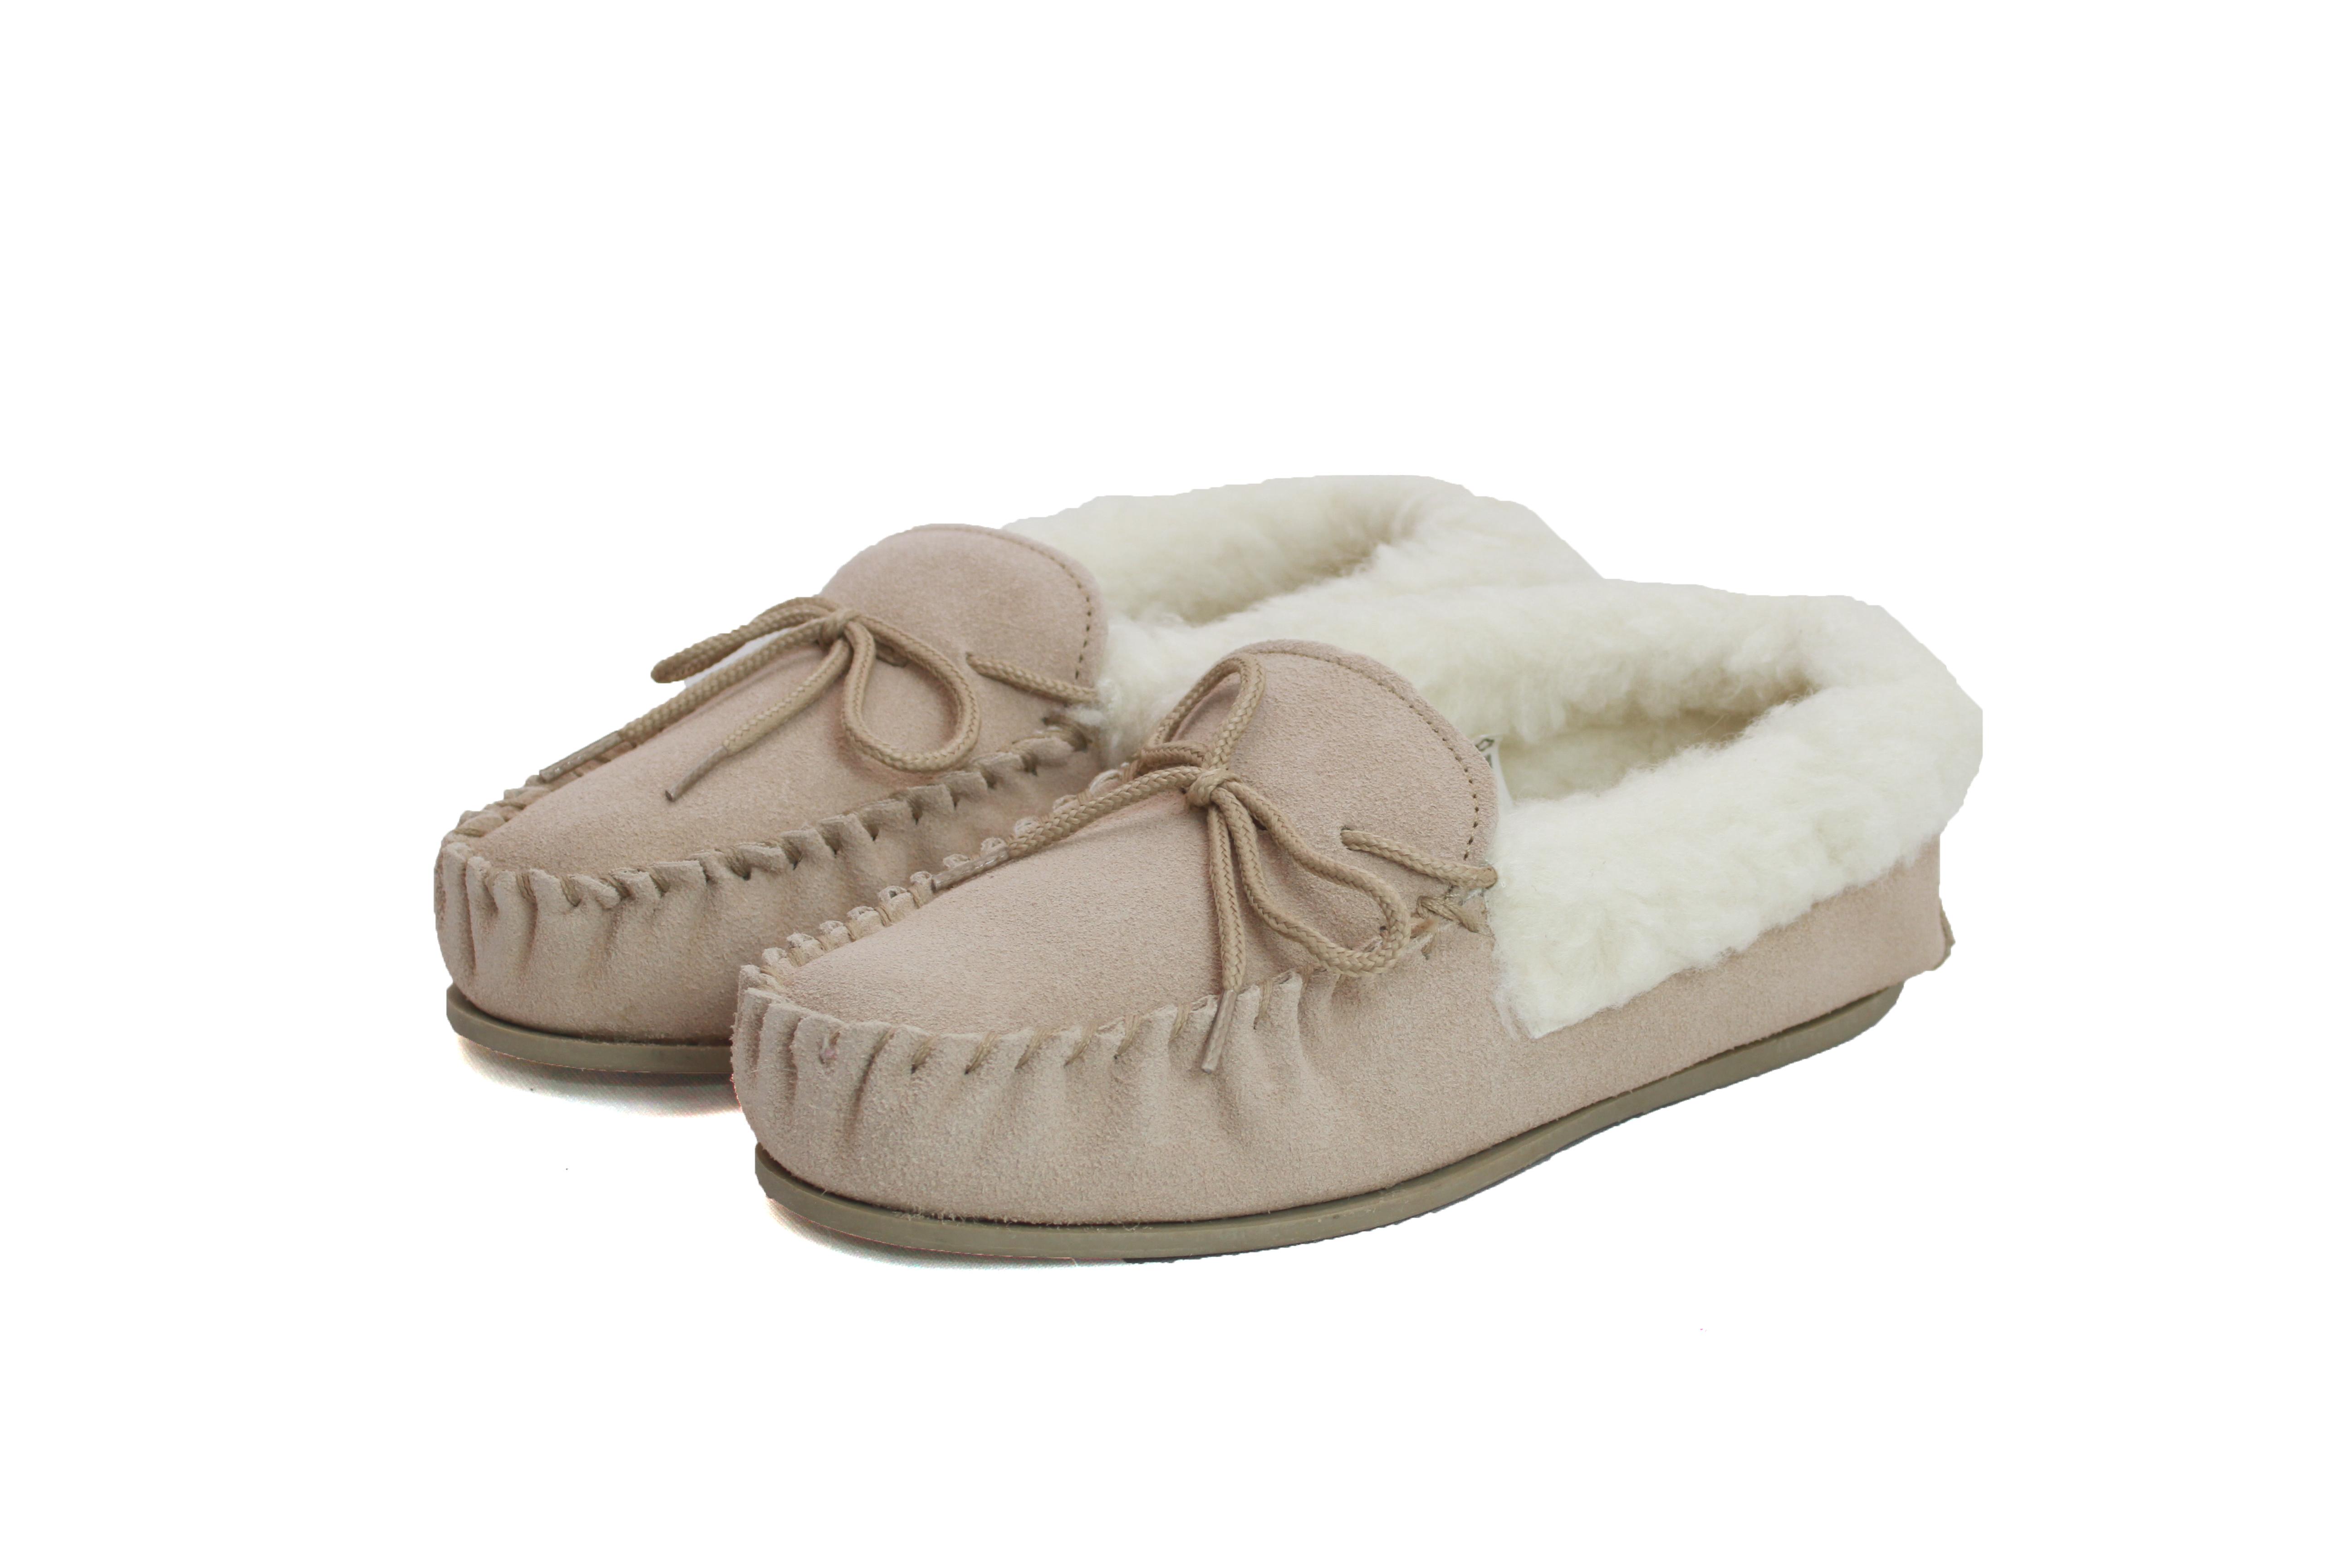 Ladies Hard-Sole Sheepskin Moccasin – LSM1/S